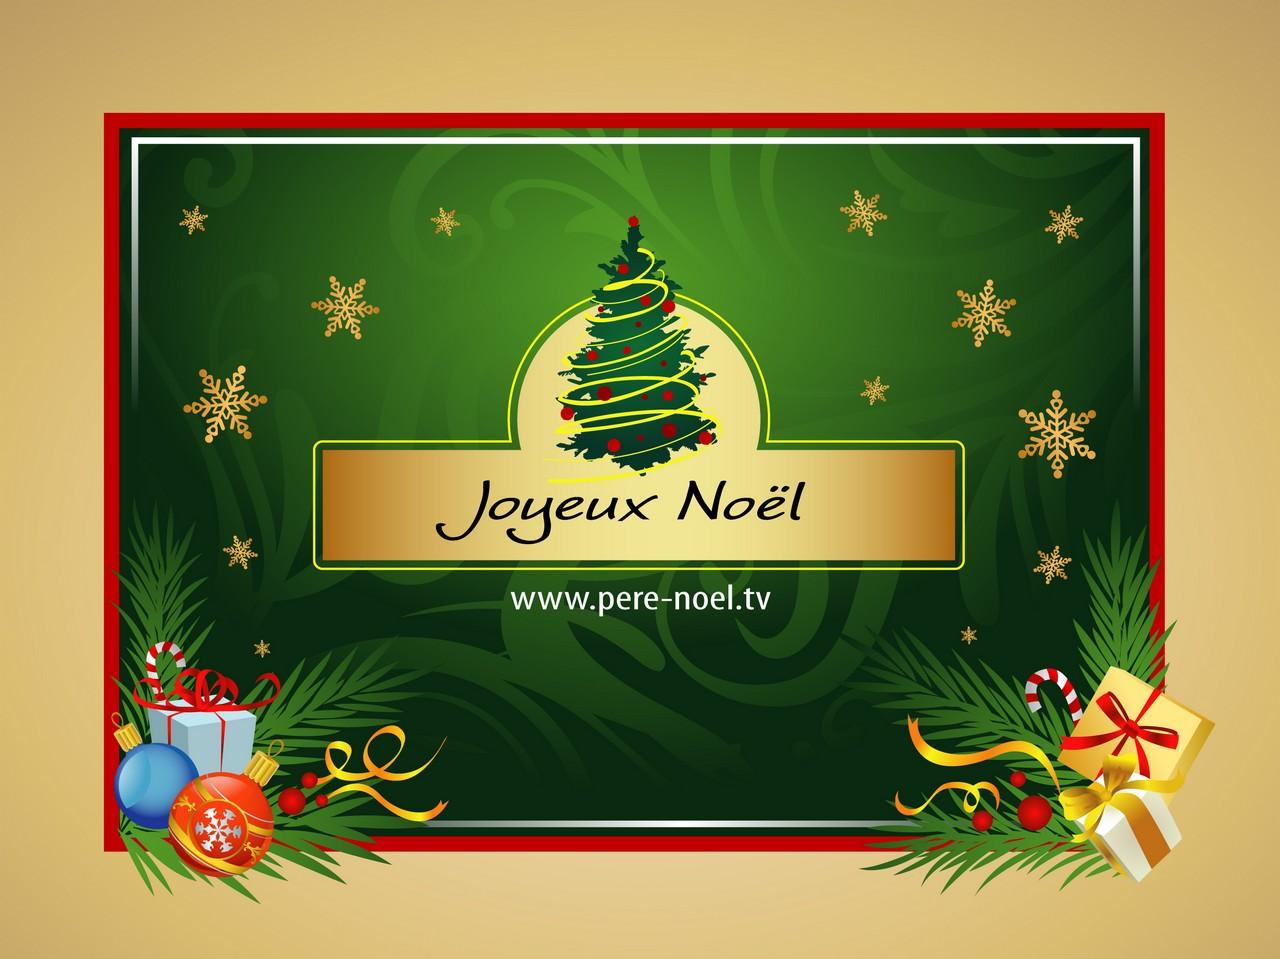 Fond Ecran Noel Gratuit Fond Ecran Pere Noel Pere Noel Tv